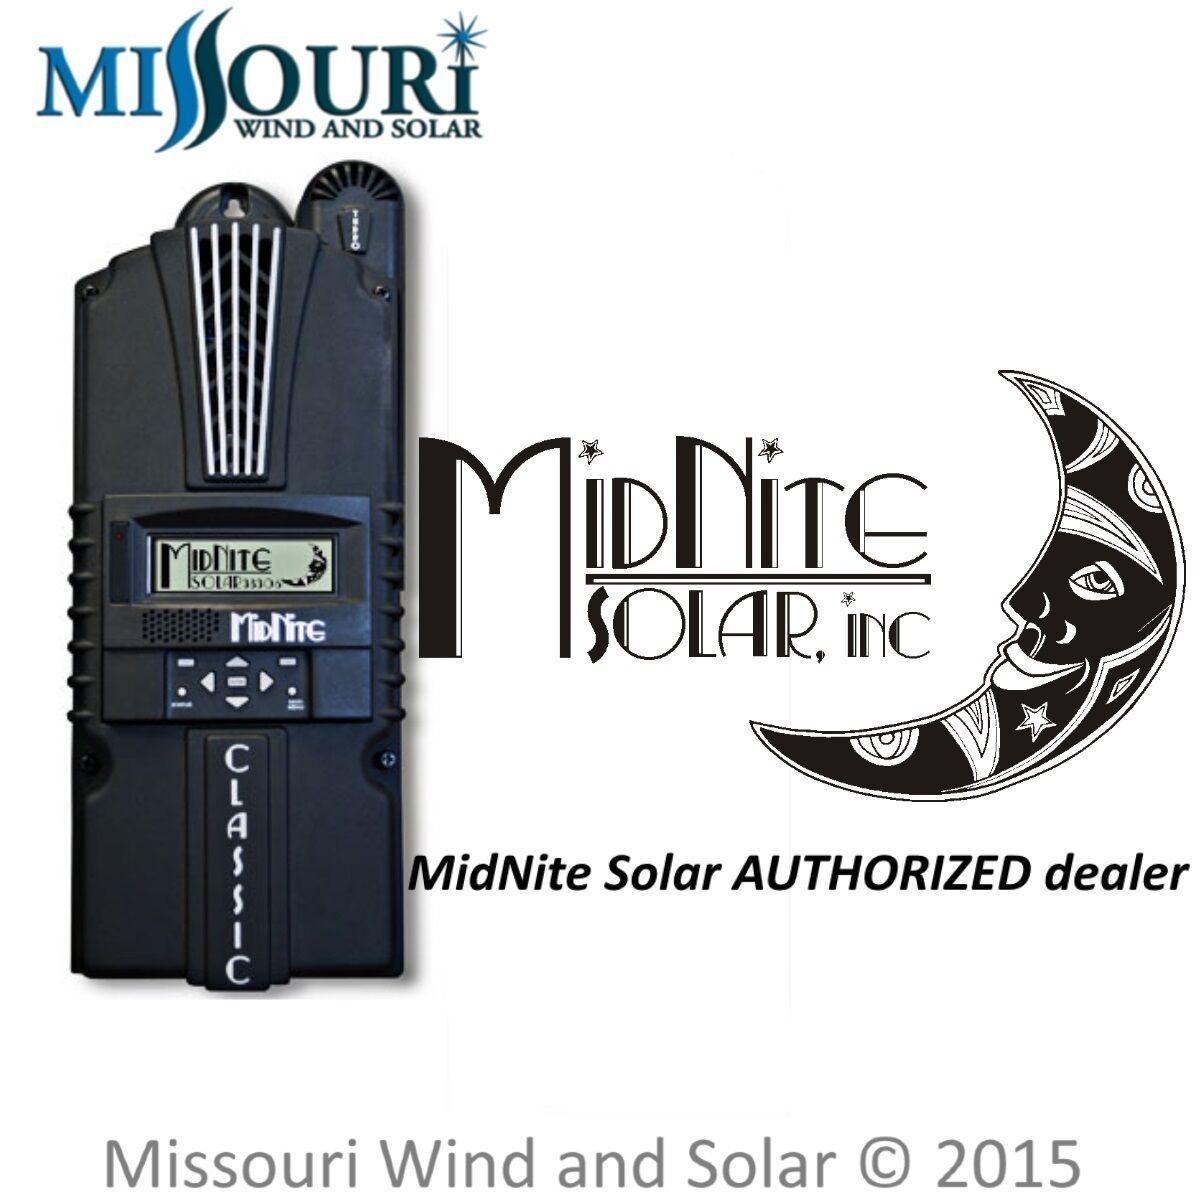 Midnite Solar Classic 150 Mppt Charge Controller Regulator